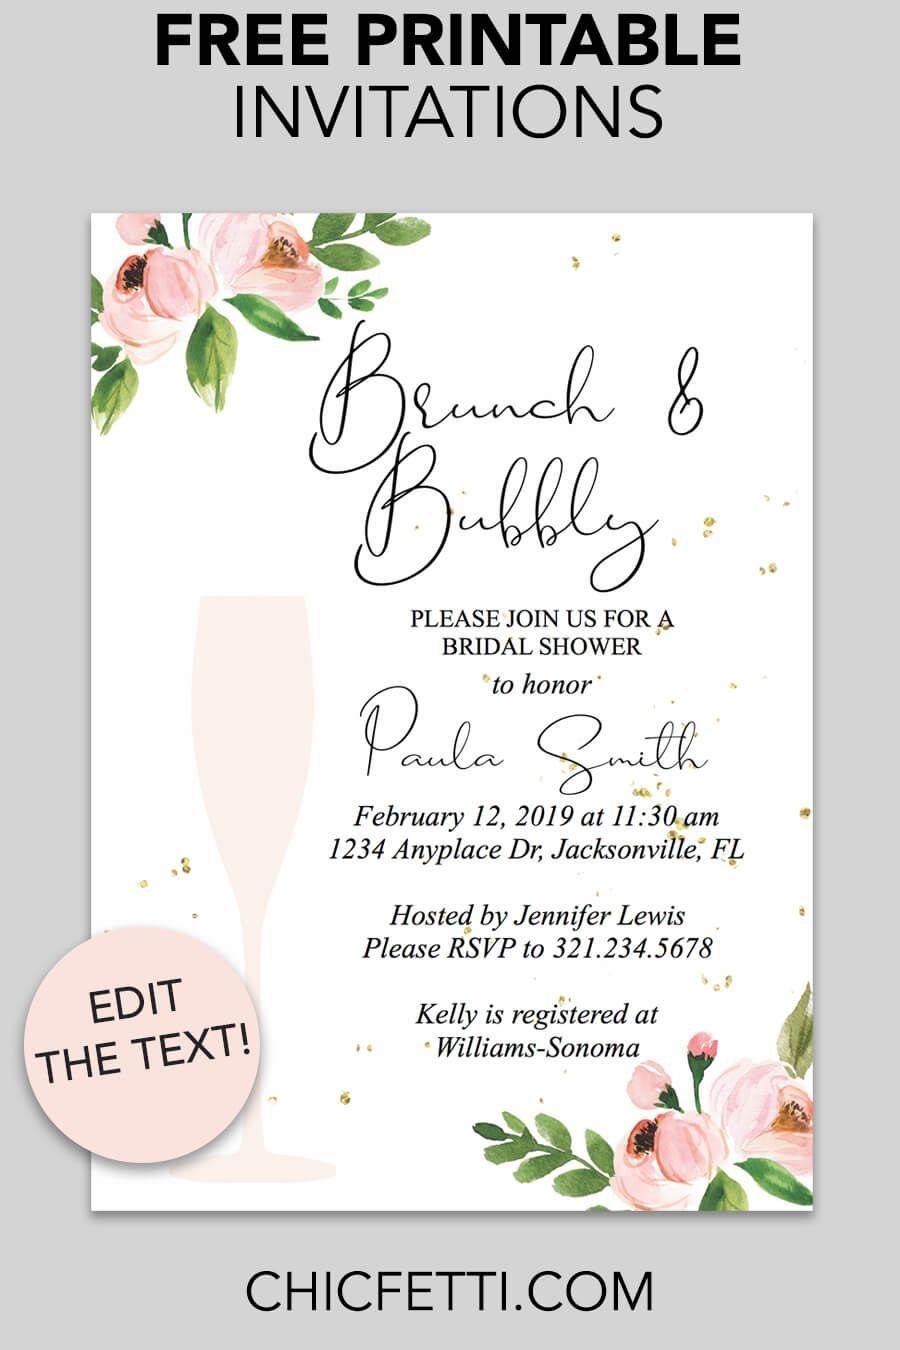 Bridal Shower Printable Invitation (Floral Bubbly | Invitations - Free Printable Wedding Invitations Templates Downloads